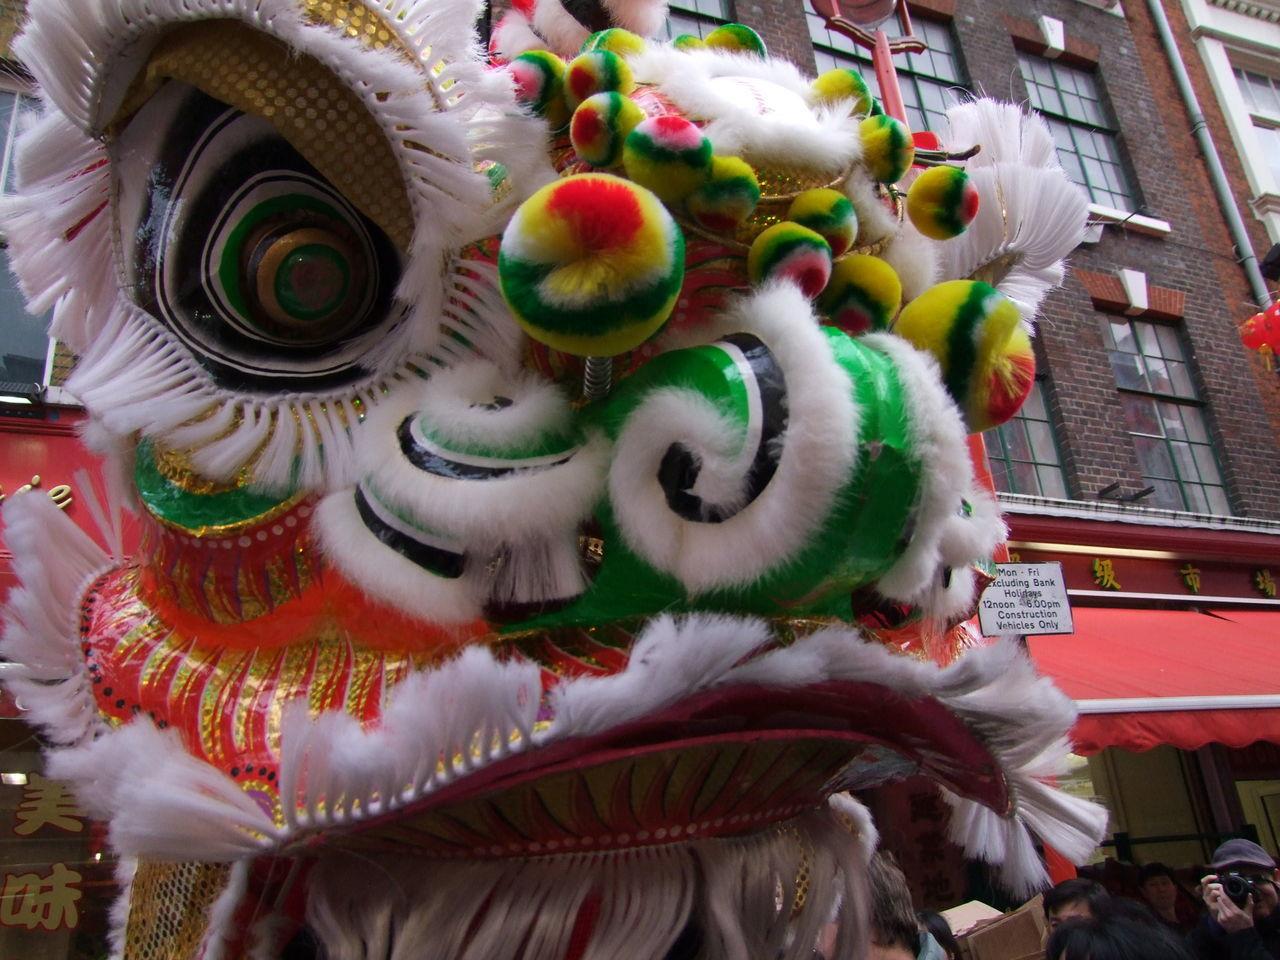 chinese dragon, animal representation, celebration, dragon, day, outdoors, no people, close-up